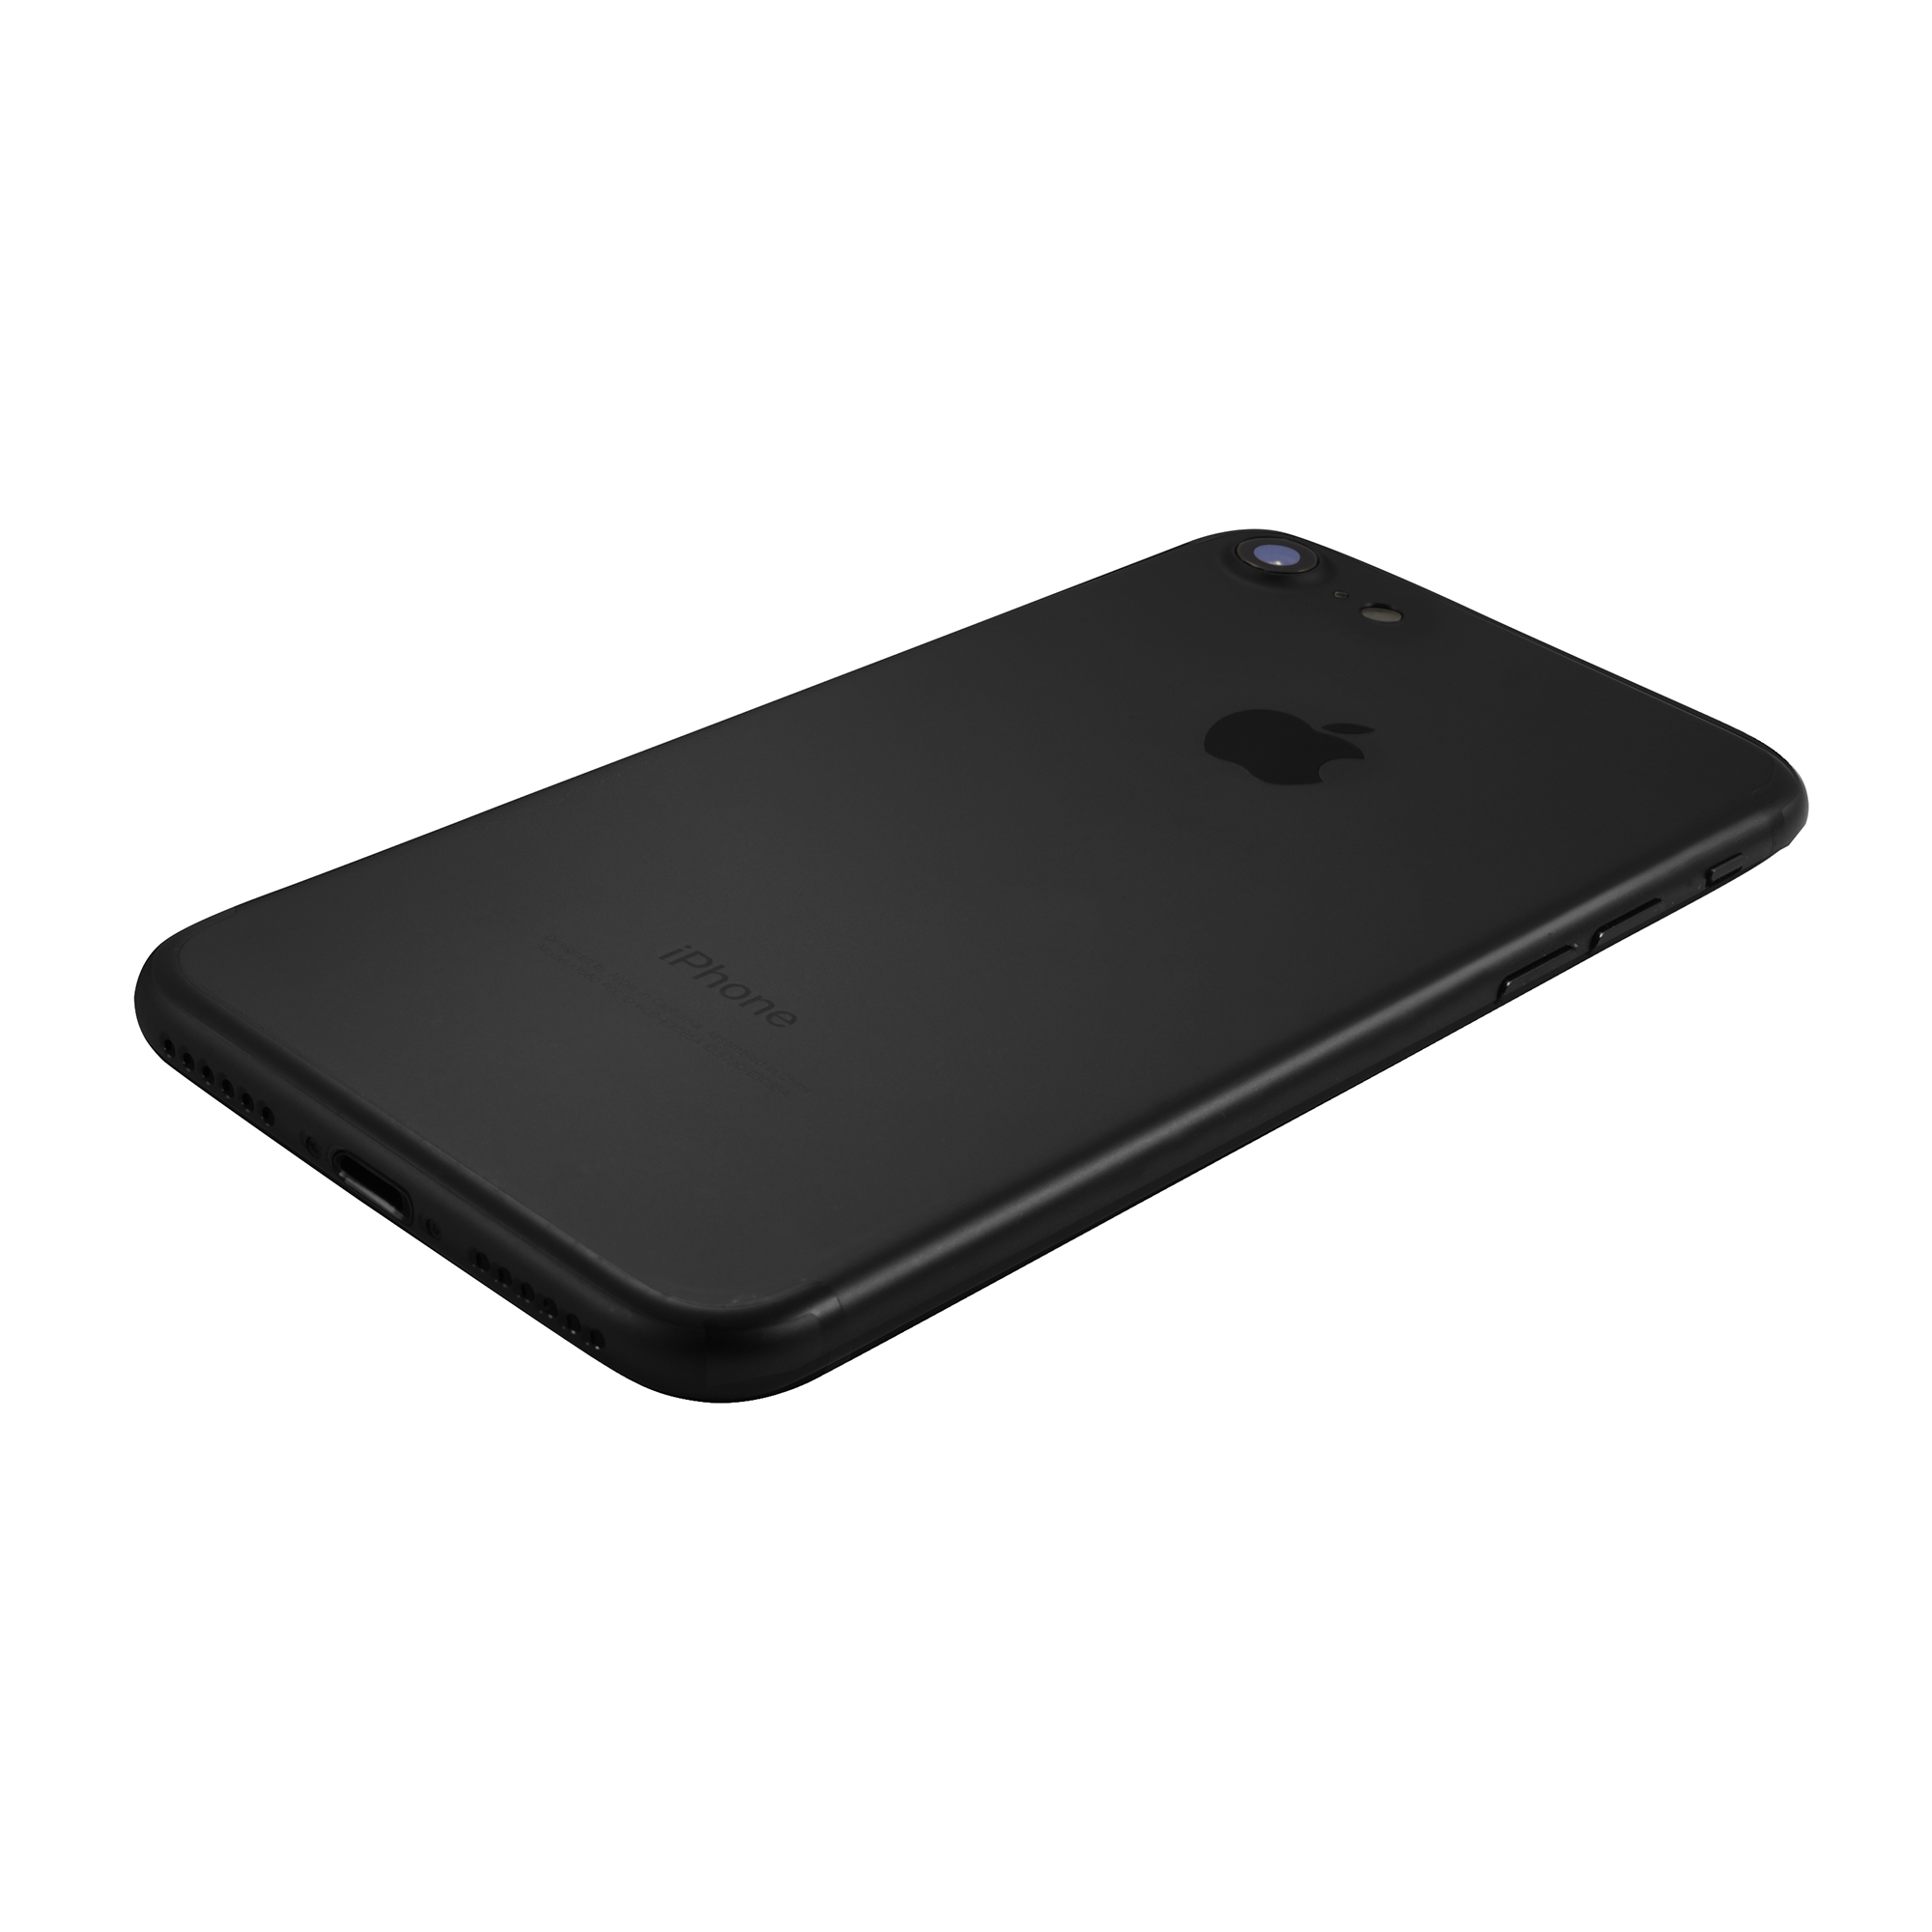 Apple-iPhone-7-a1660-32GB-LTE-CDMA-GSM-Unlocked-Very-Good thumbnail 3